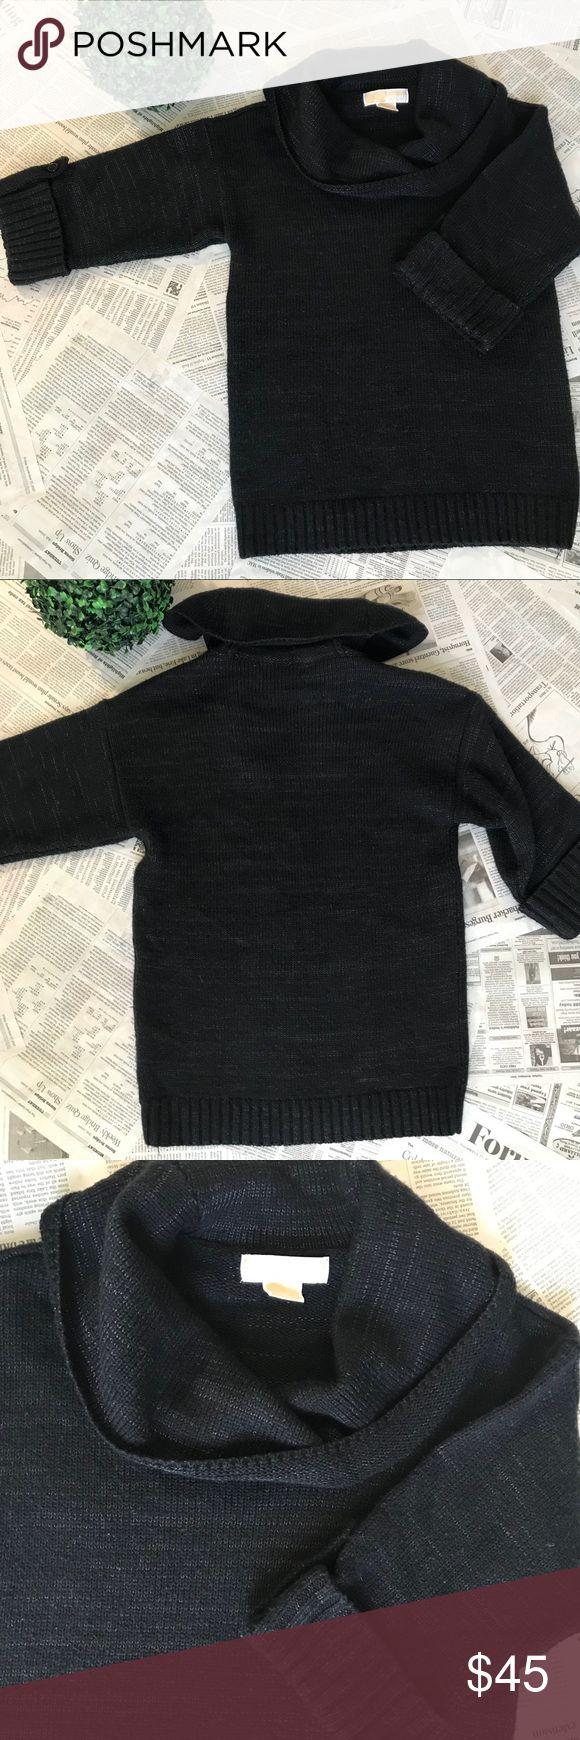 I just added this listing on Poshmark: Michael Kors Short Sleeve Sweater. #shopmycloset #poshmark #fashion #shopping #style #forsale #Michael Kors #Sweaters